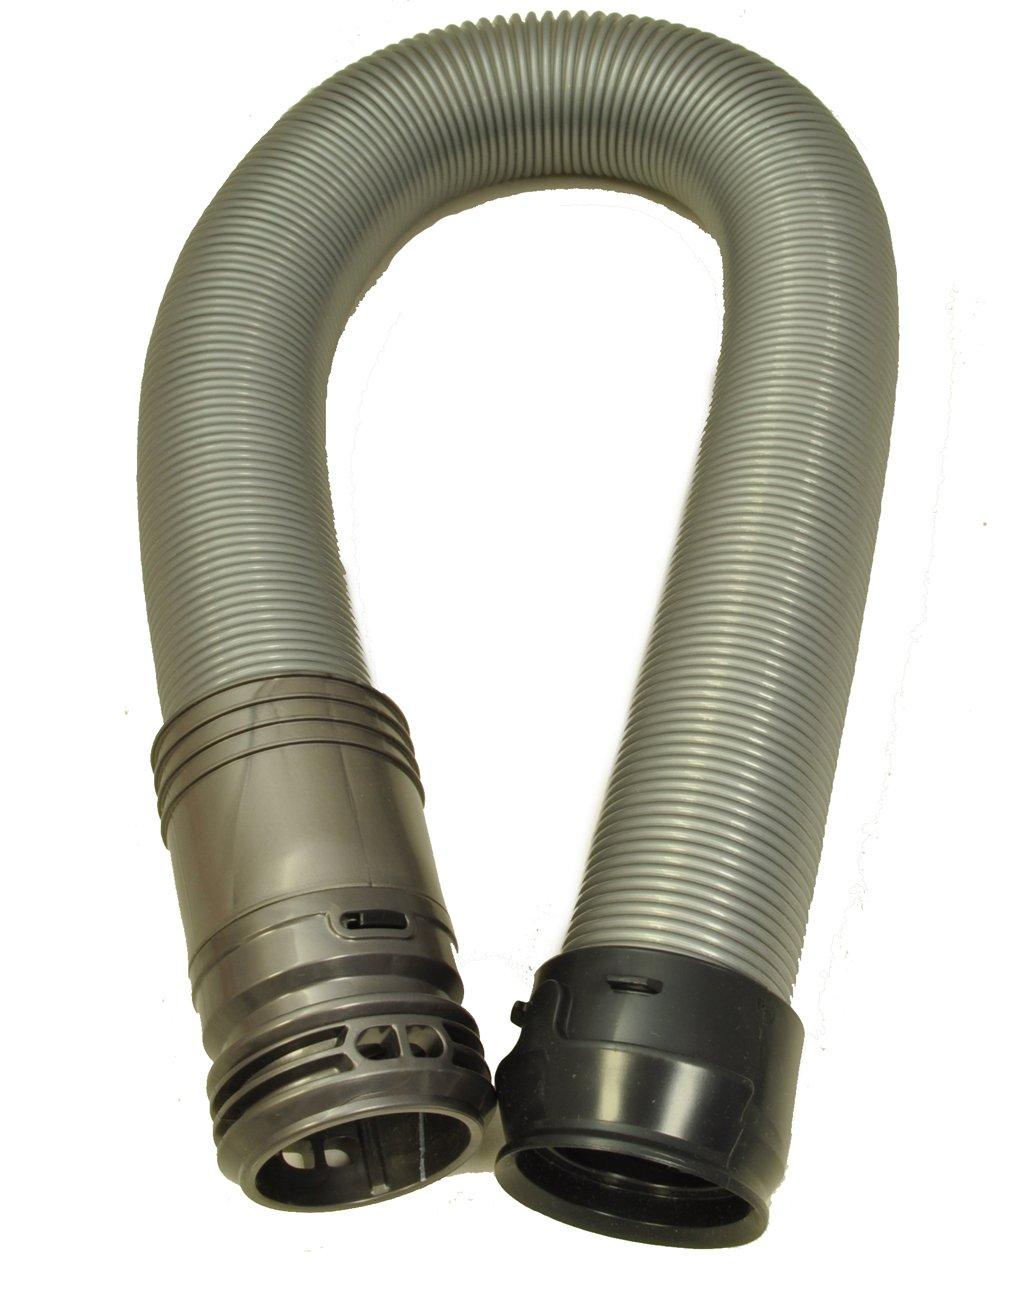 Dyson DC17 Vacuum Cleaner Hose